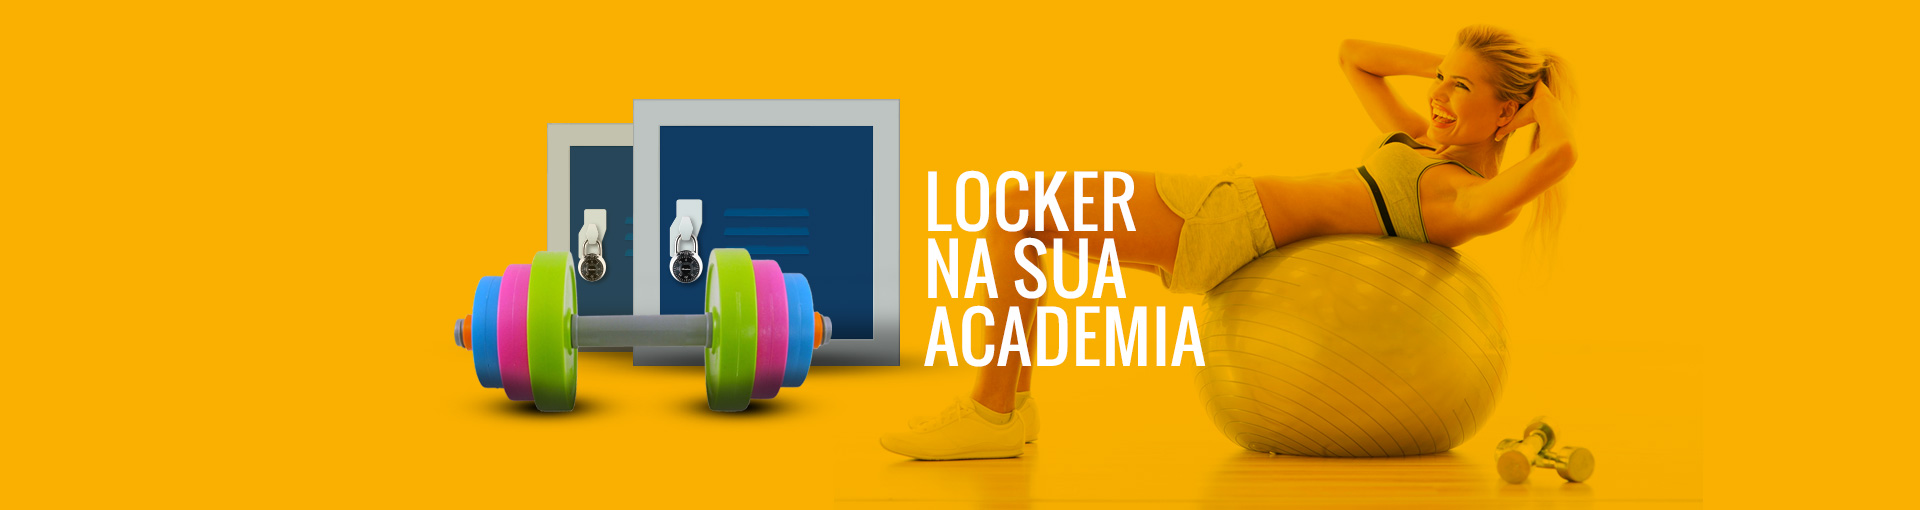 05-academia